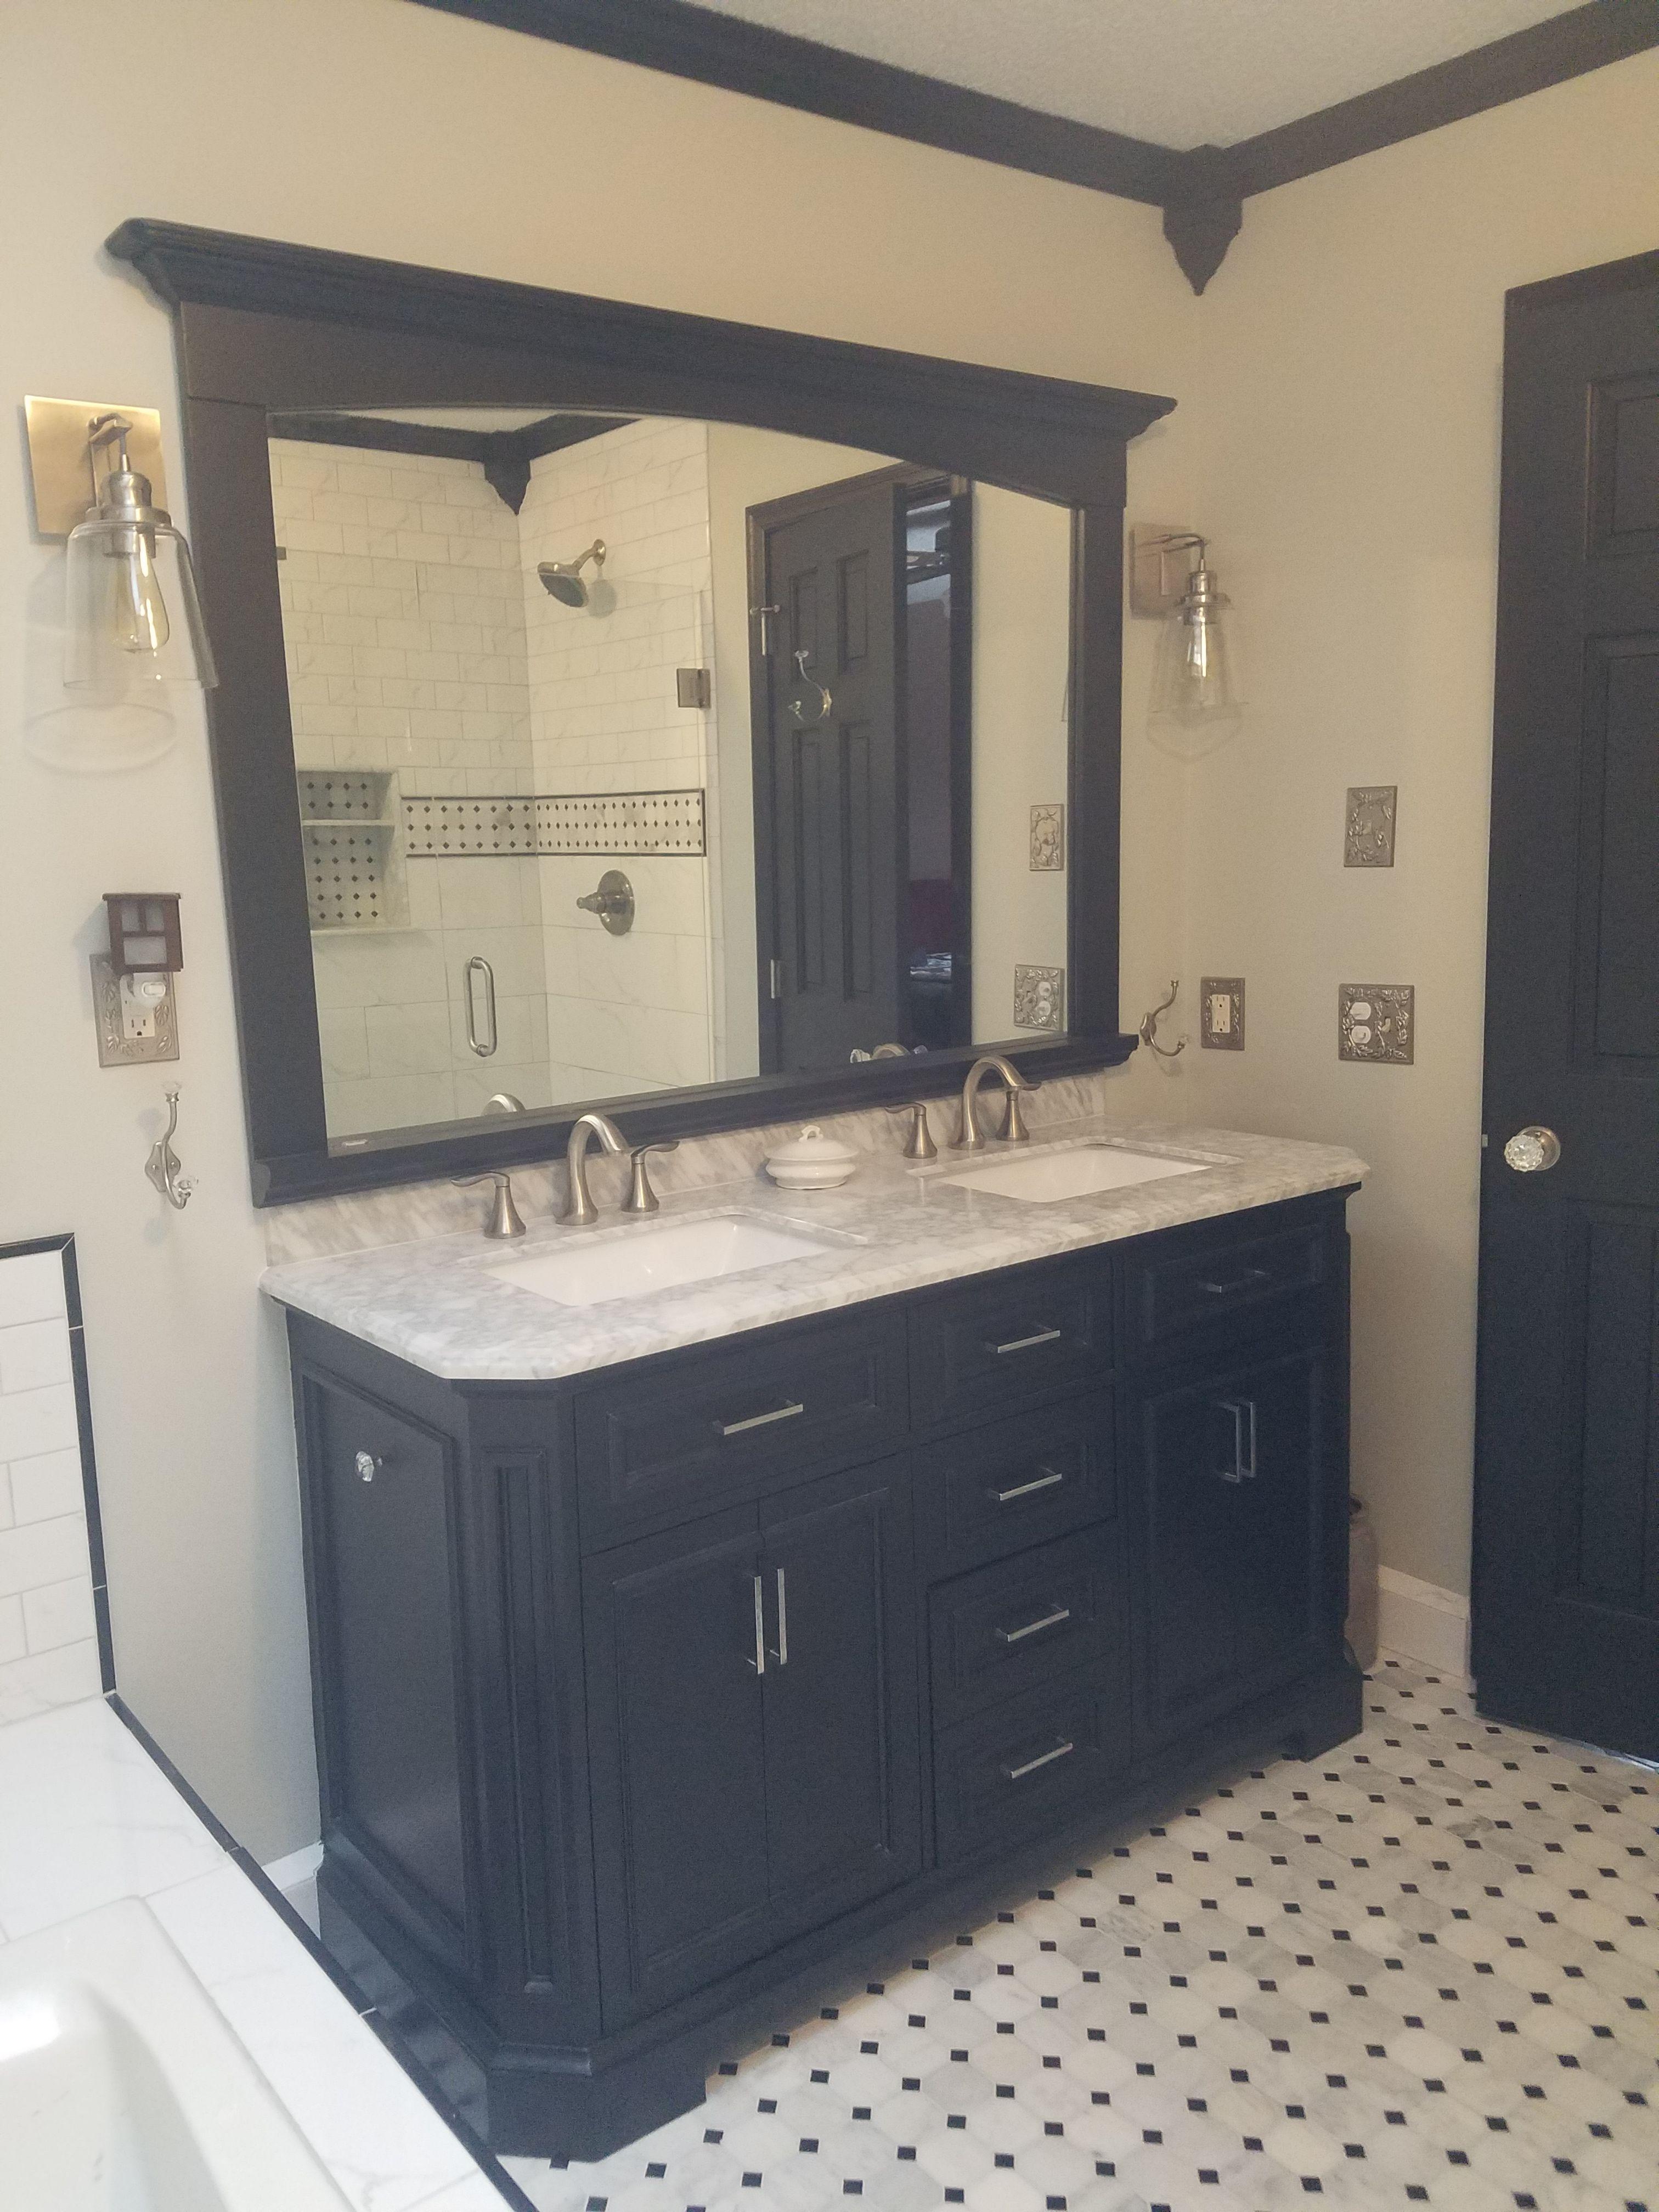 vanity bathroom remodel category st vanities cabinets custom mn paul built bath valley linen